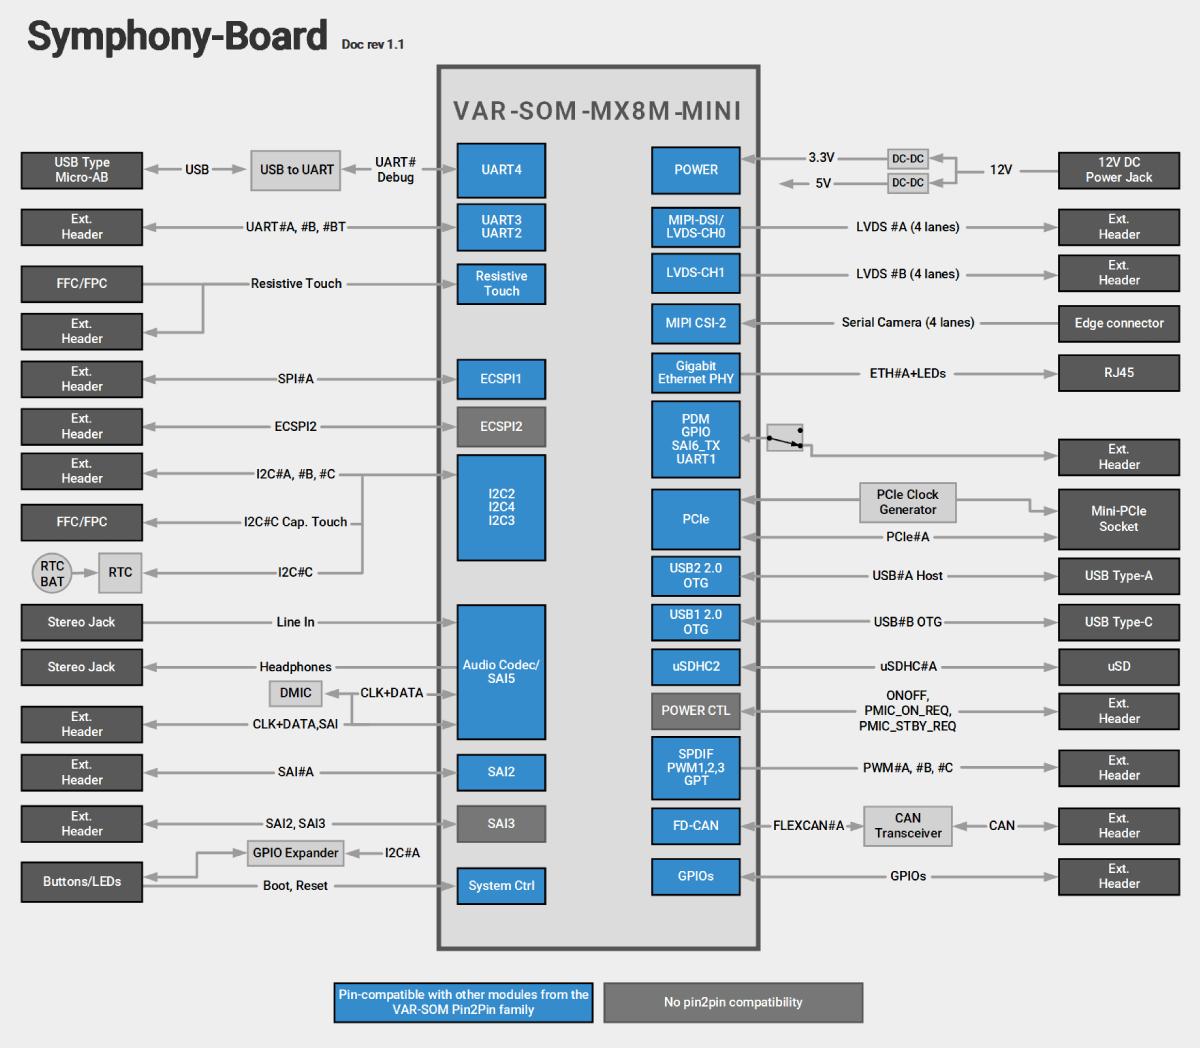 Symphony-Board With VAR-SOM-MX8M-MINI Block Diagram Diagram